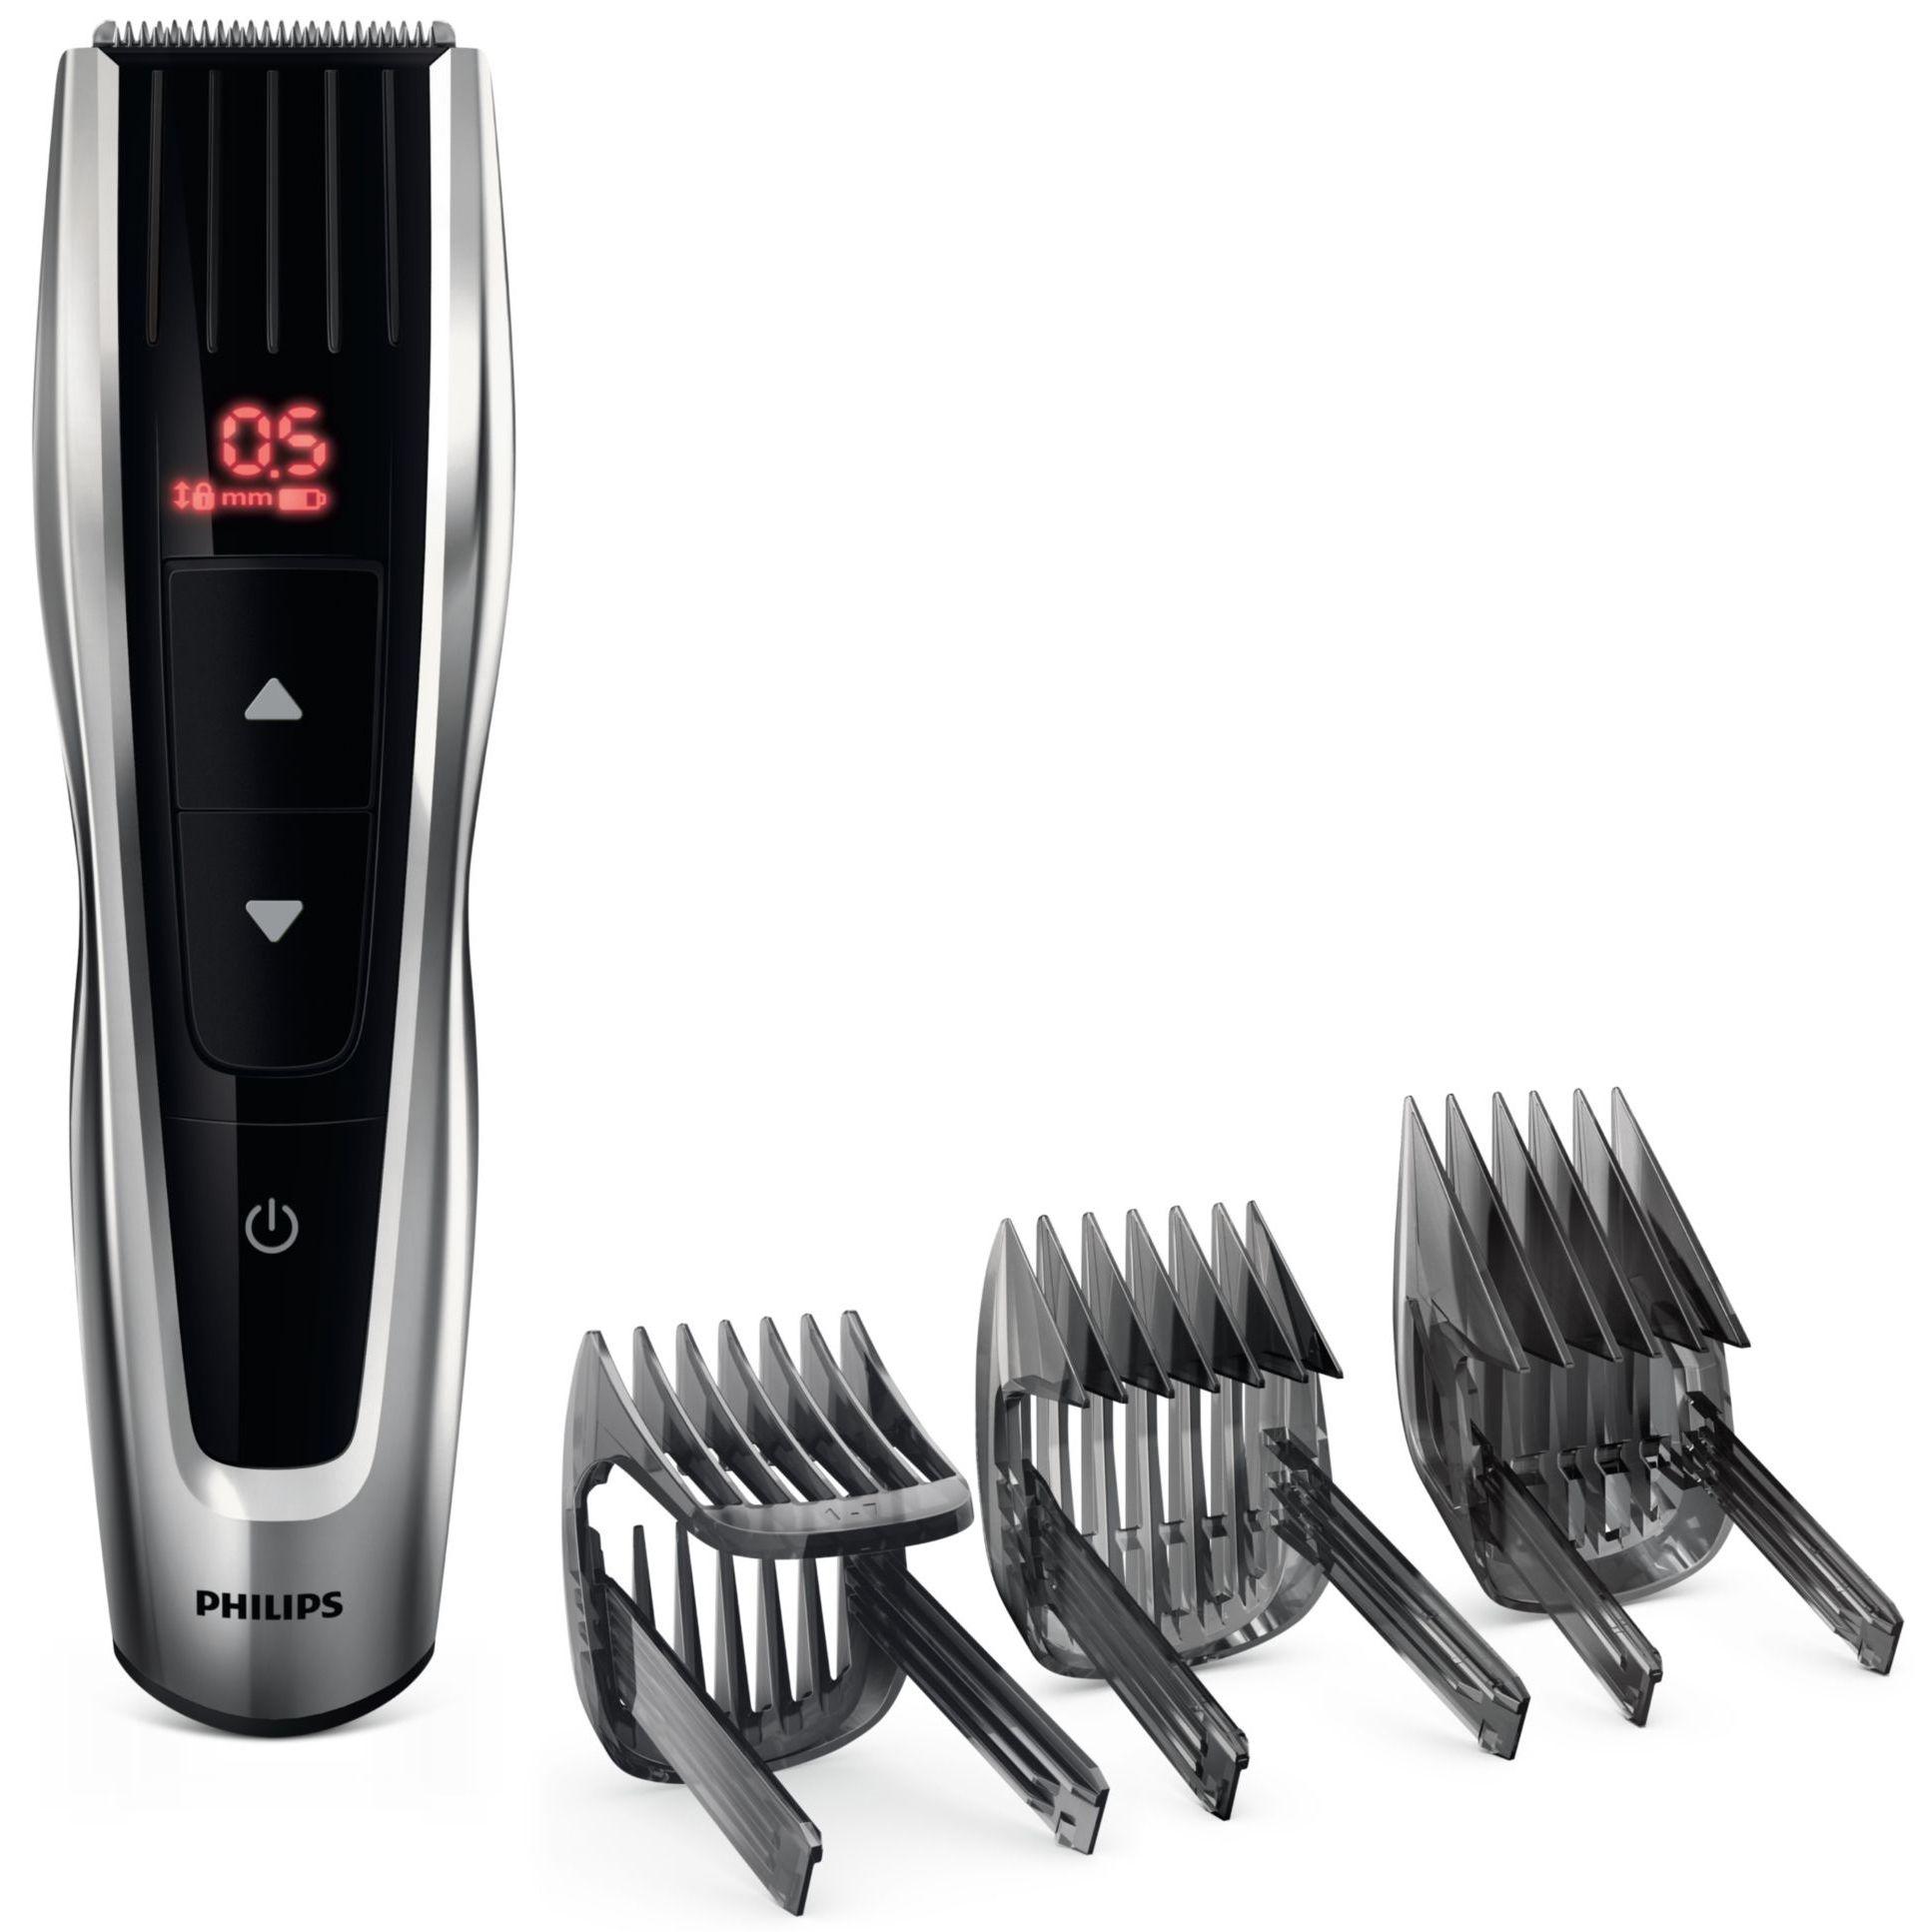 Aparat de tuns Philips Hairclipper series 7000 60 trepte Negru-argintiu